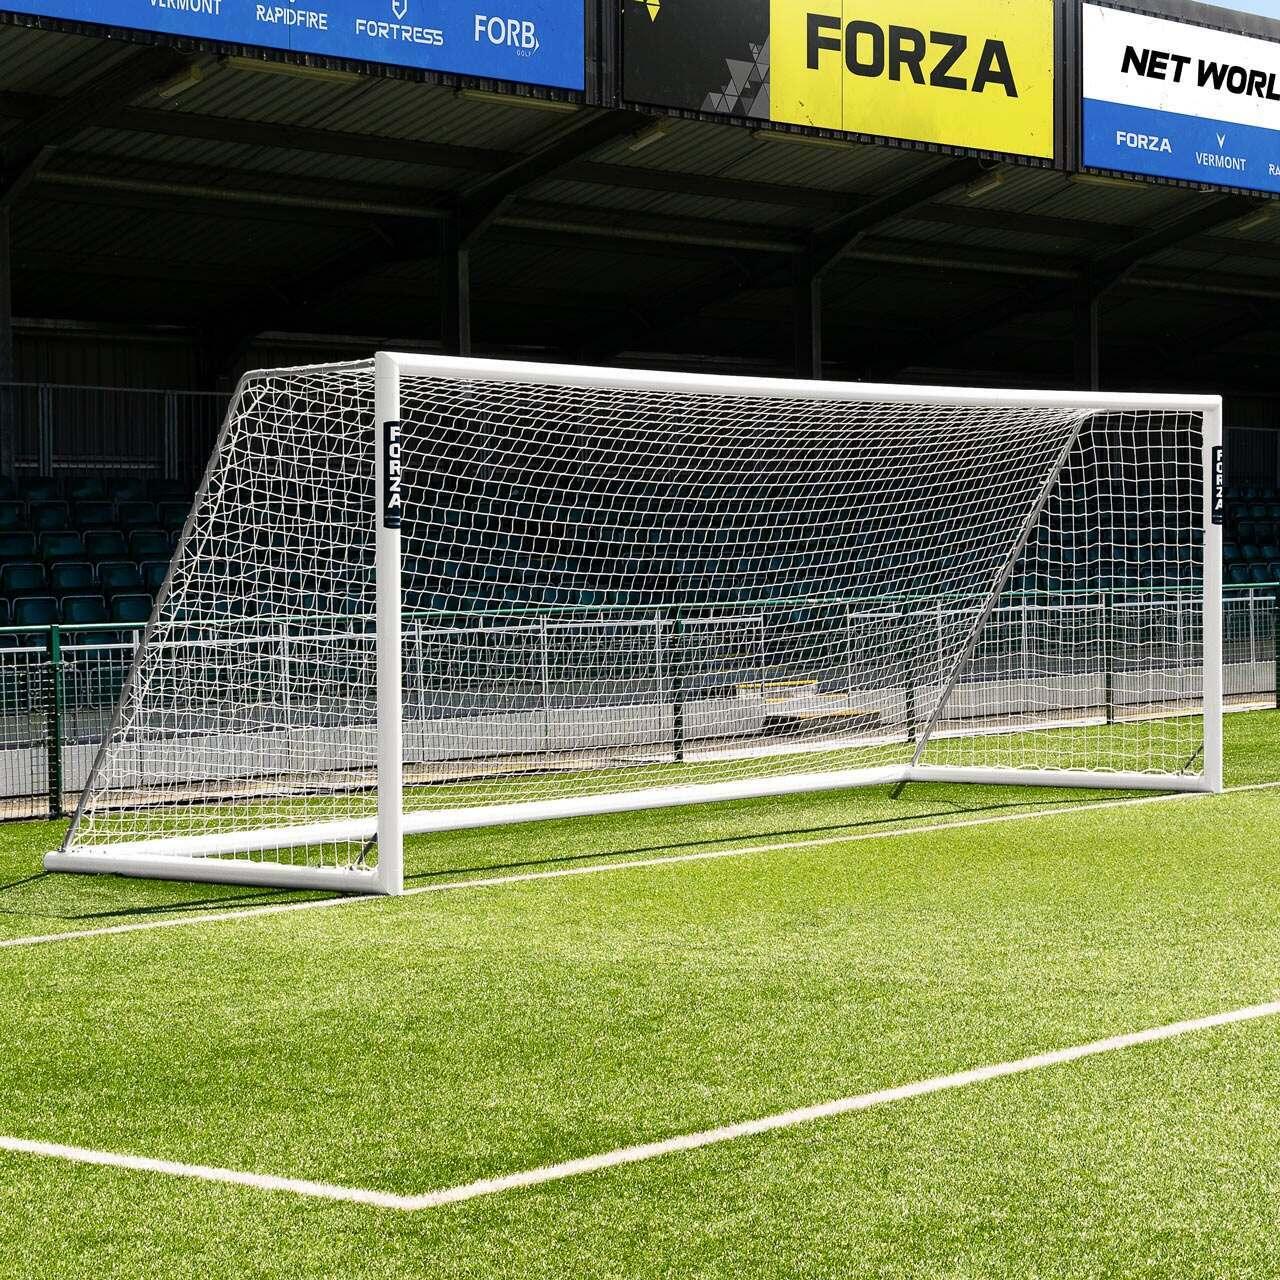 24 x 8 FORZA Alu110 Freestanding Football Goal